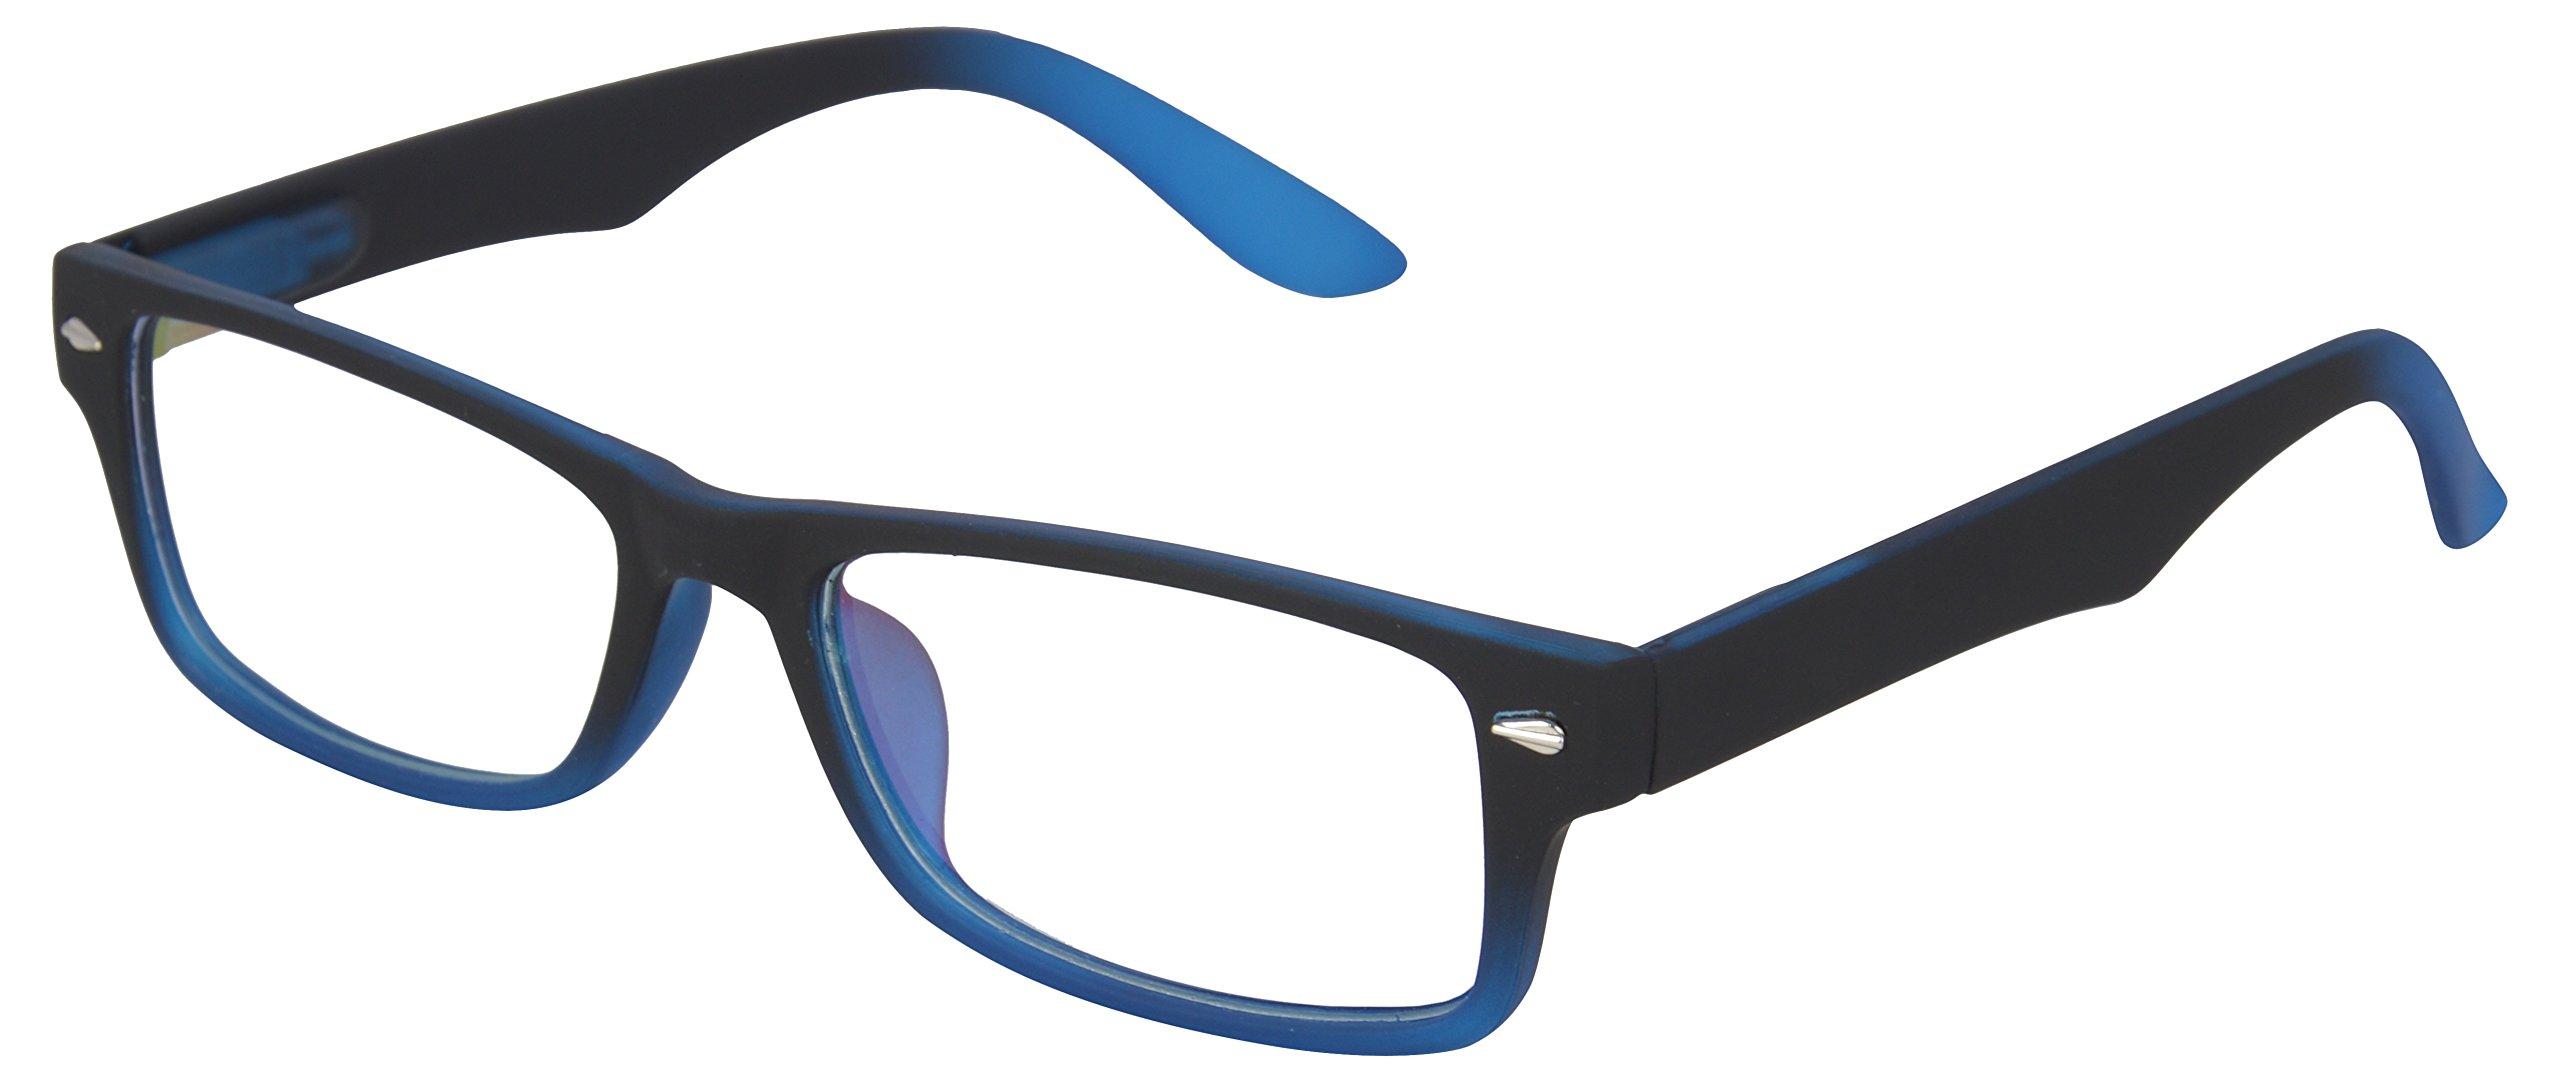 Eye Frames: Buy Eye Frames Online at Best Prices in India - Amazon.in